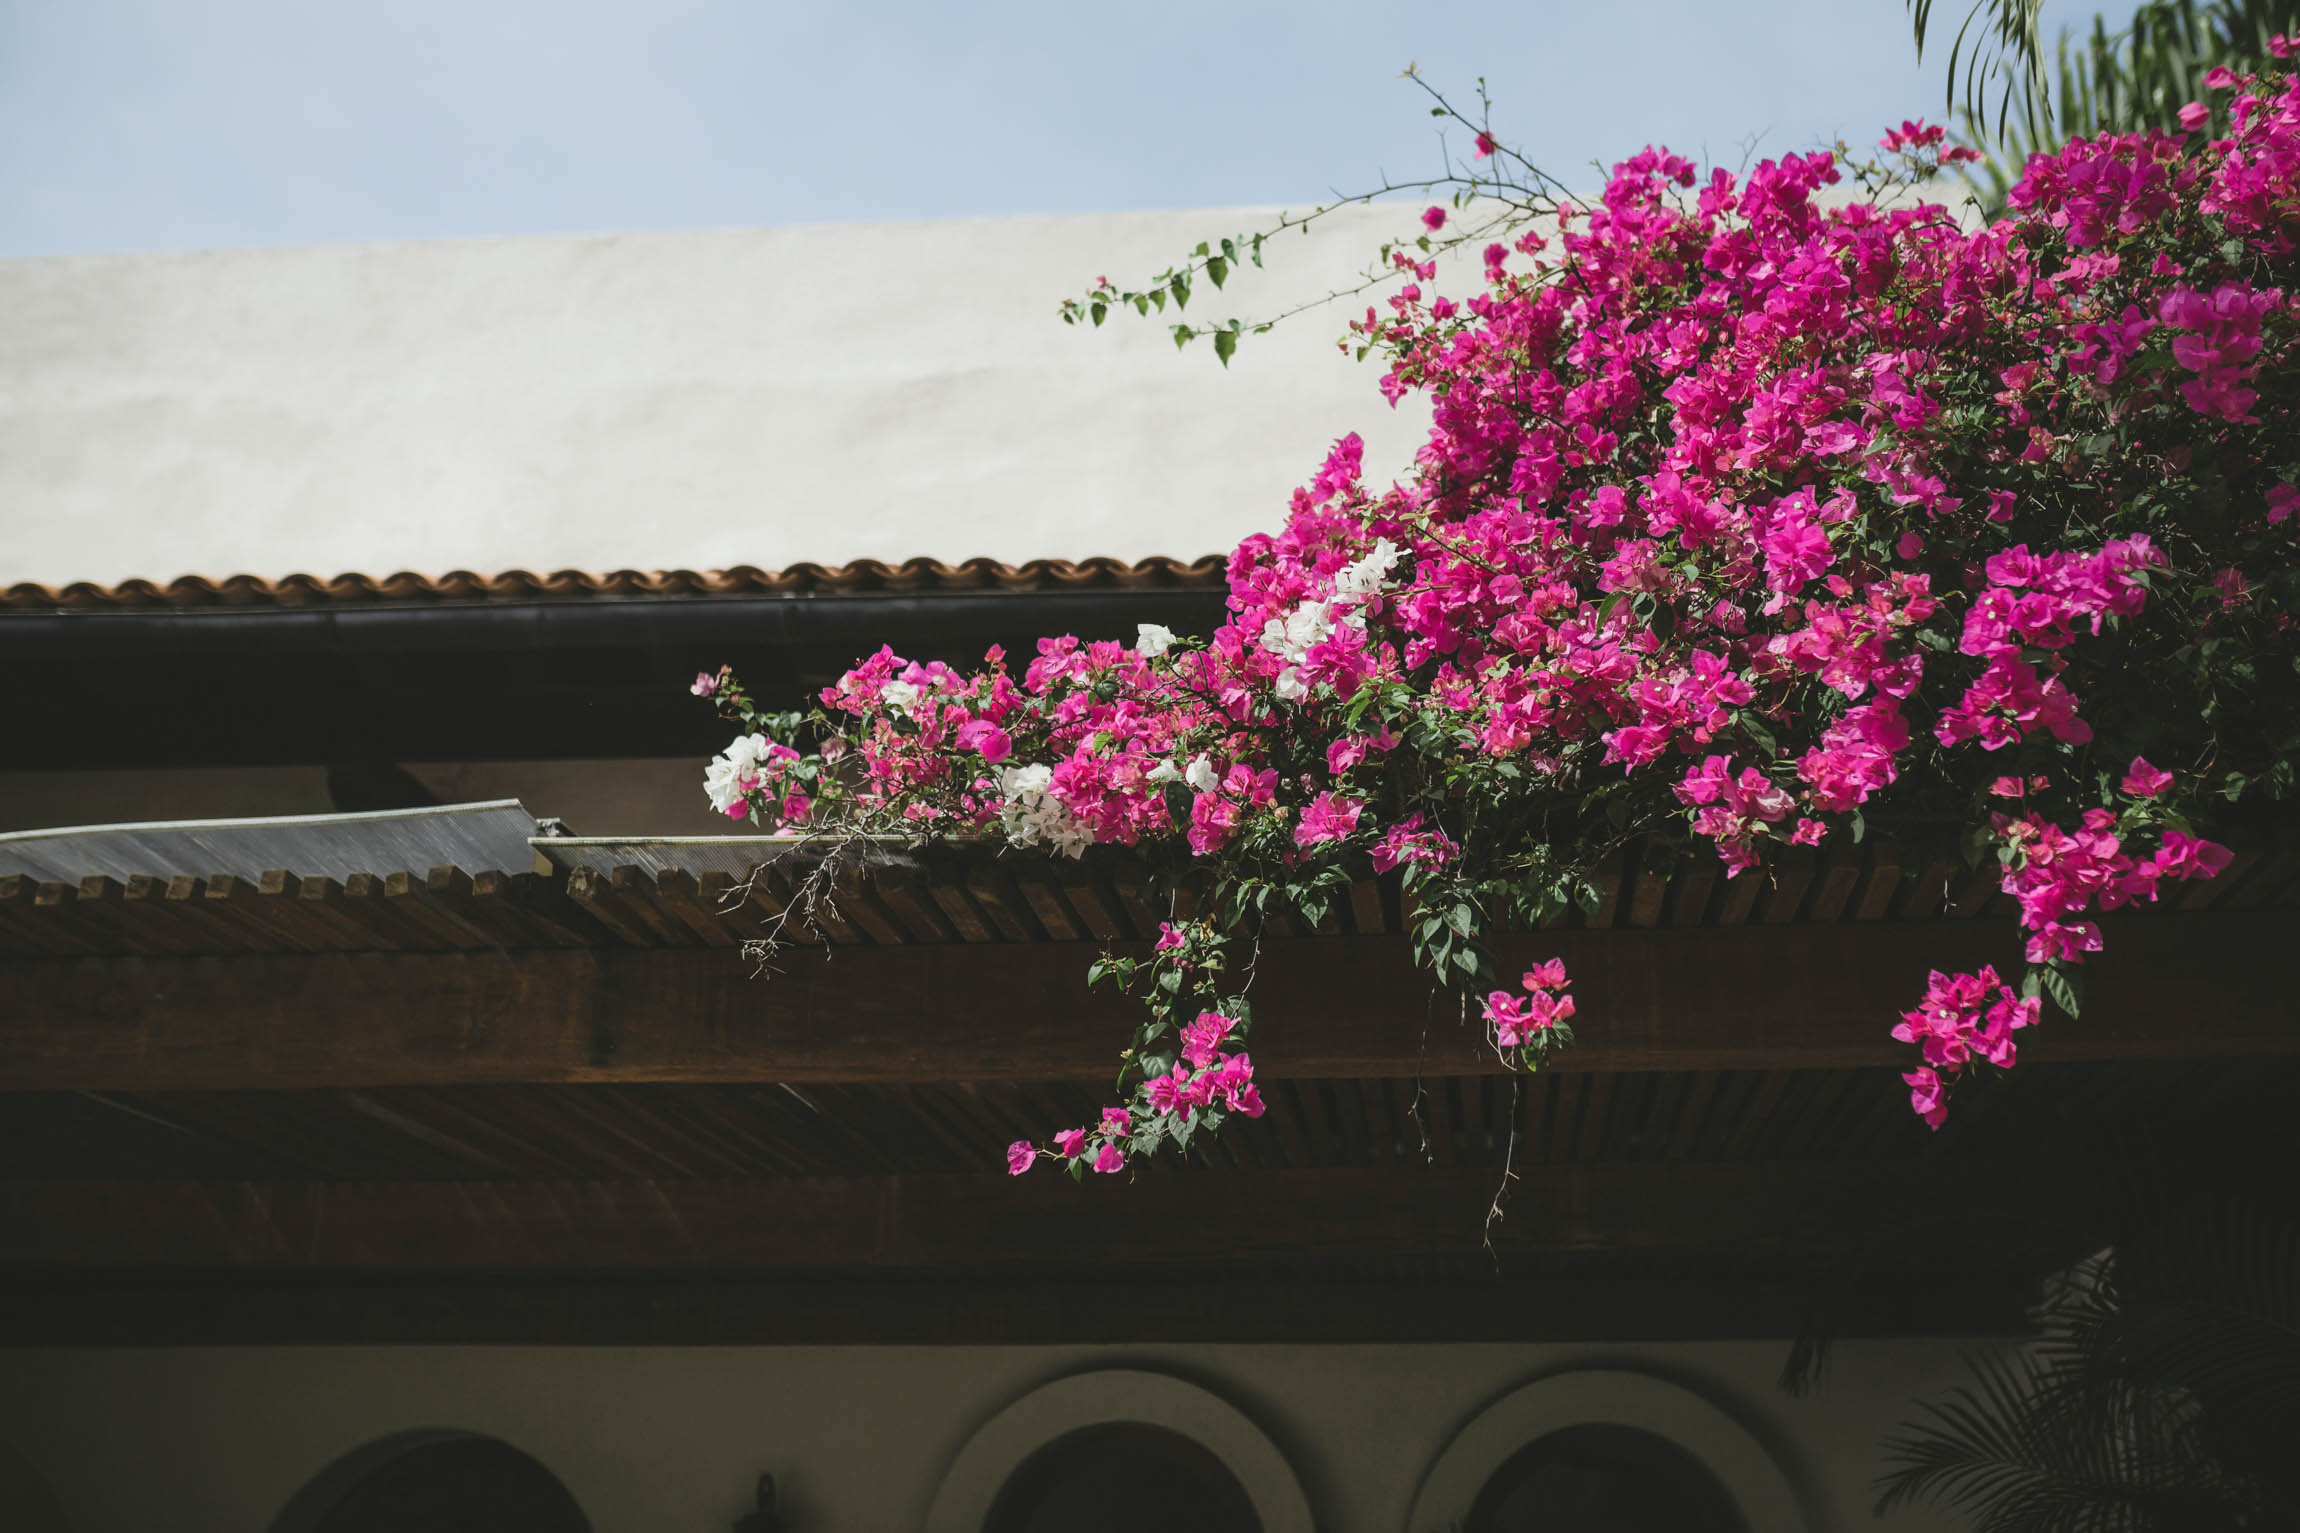 minnesota mexico destination wedding photographer-40.jpg